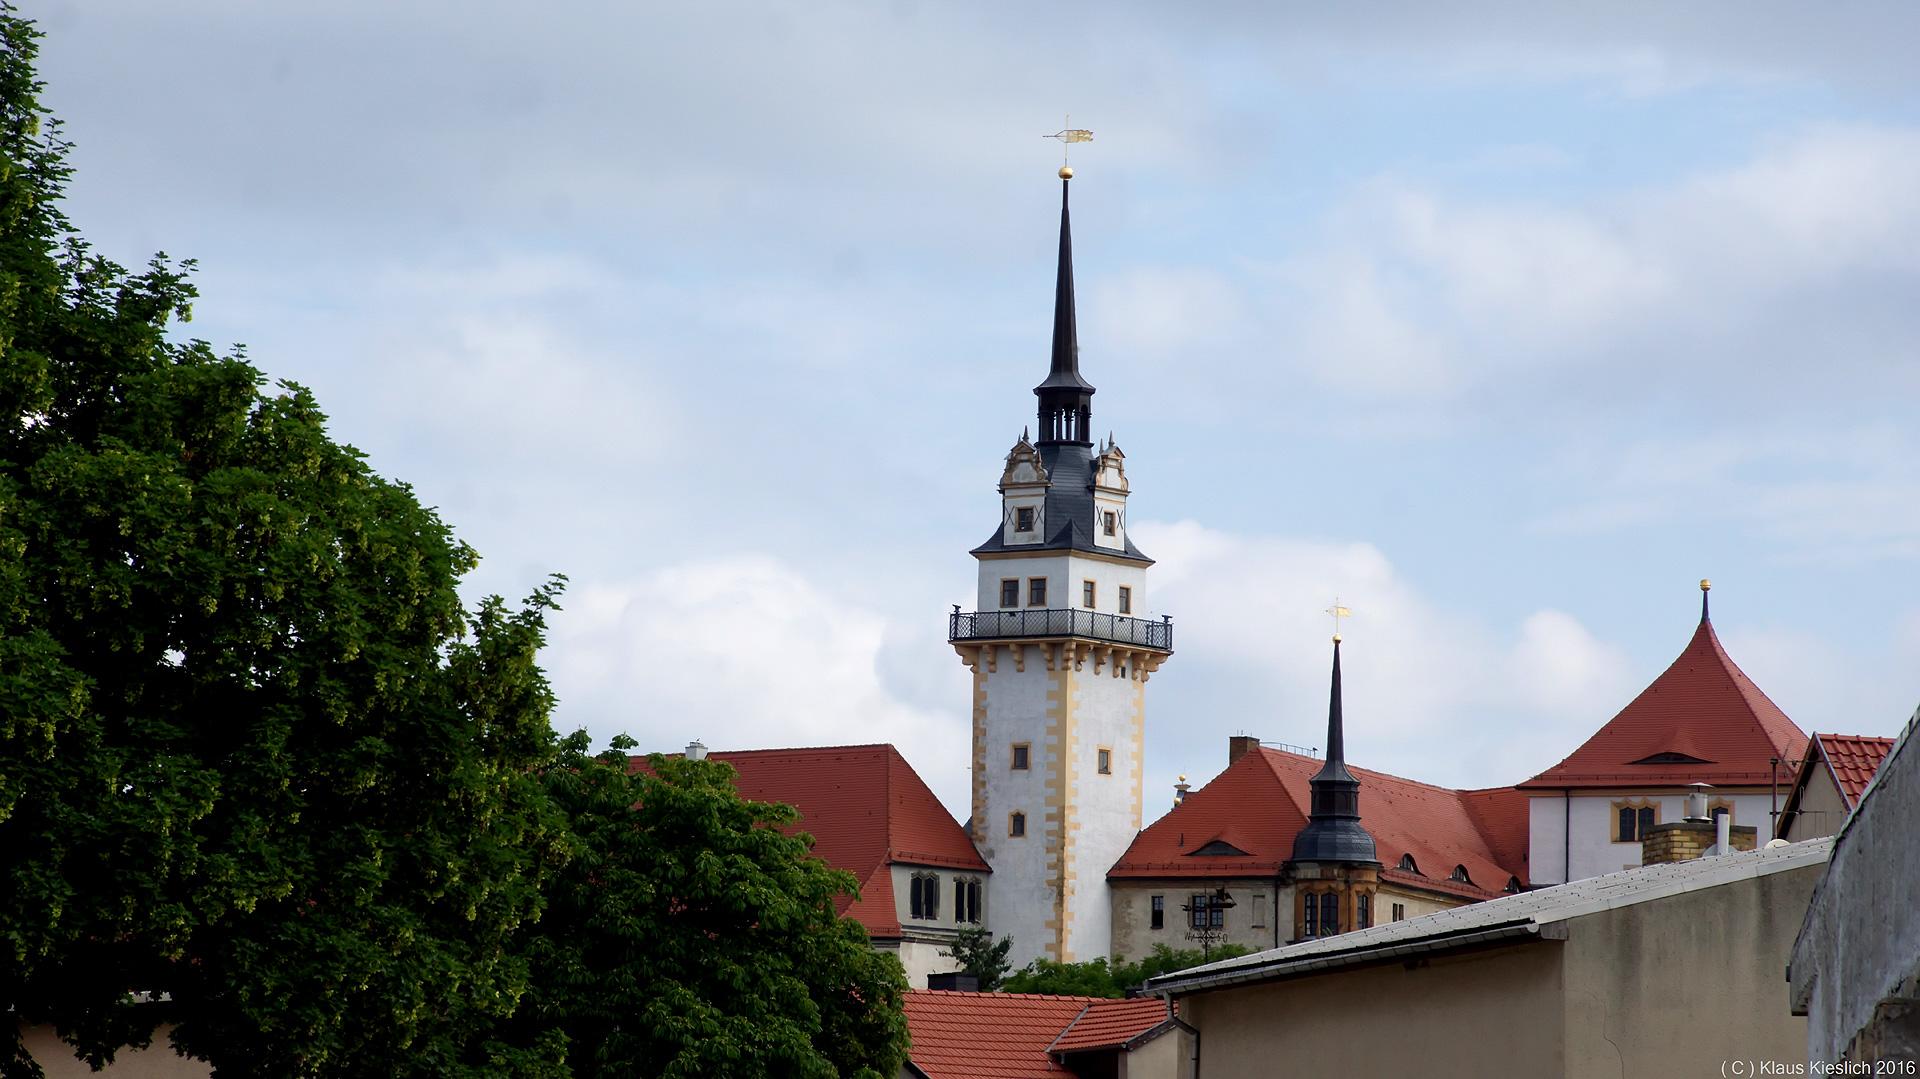 Blick zum Schloß Hartenfels in Torgau